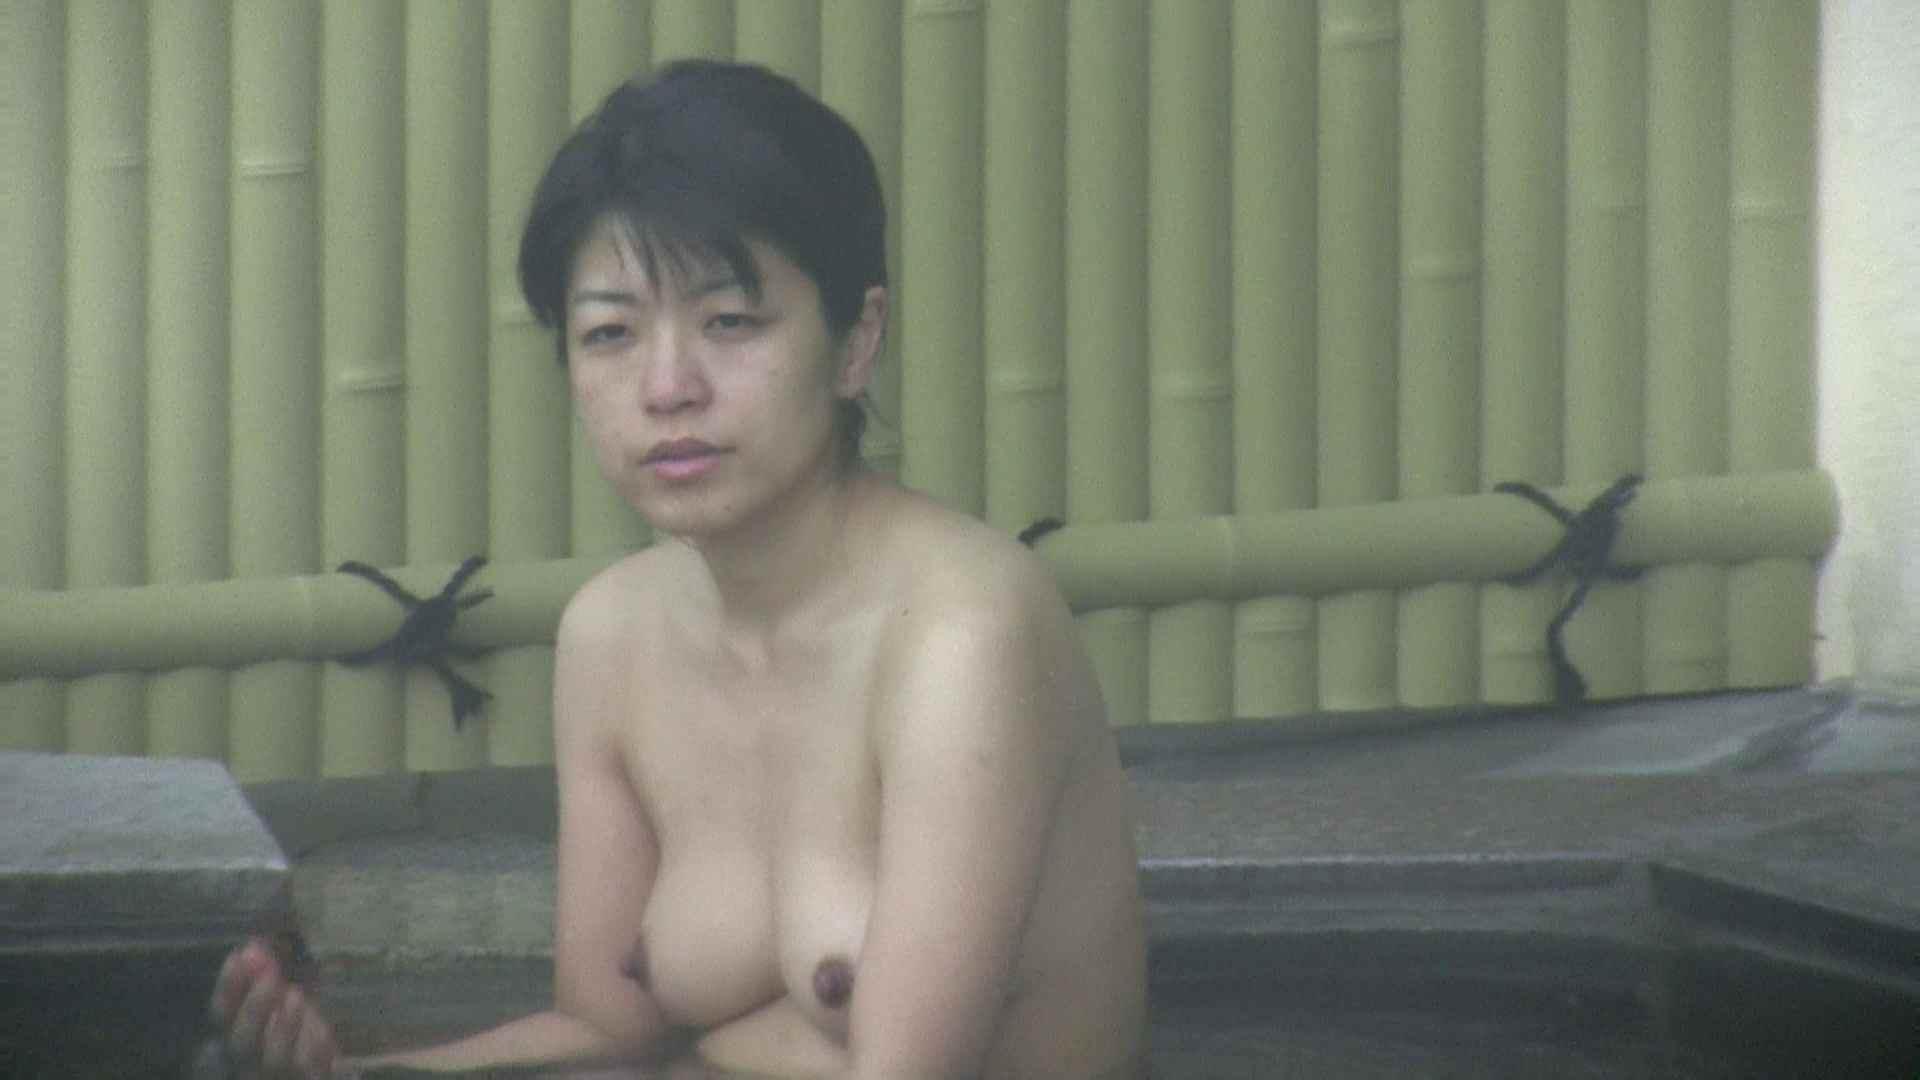 Aquaな露天風呂Vol.585 HなOL | 盗撮  93pic 32